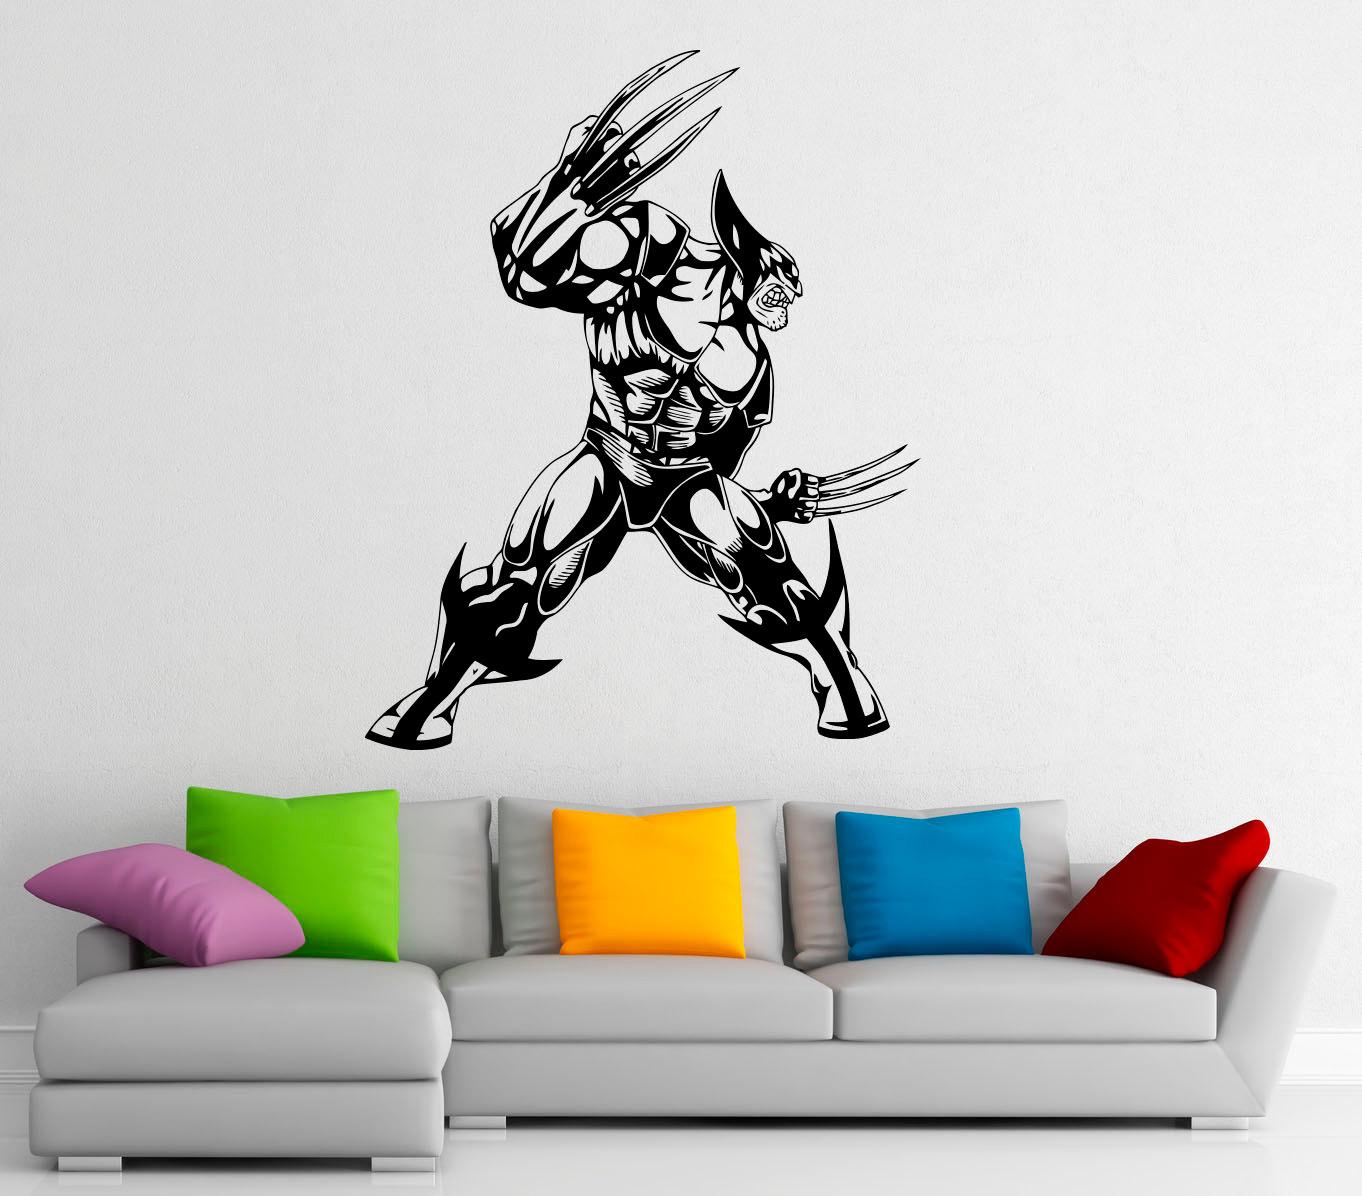 Superman Wall Murals Wolverine Hero Wall Decal Vinyl Stickers Comics Superhero